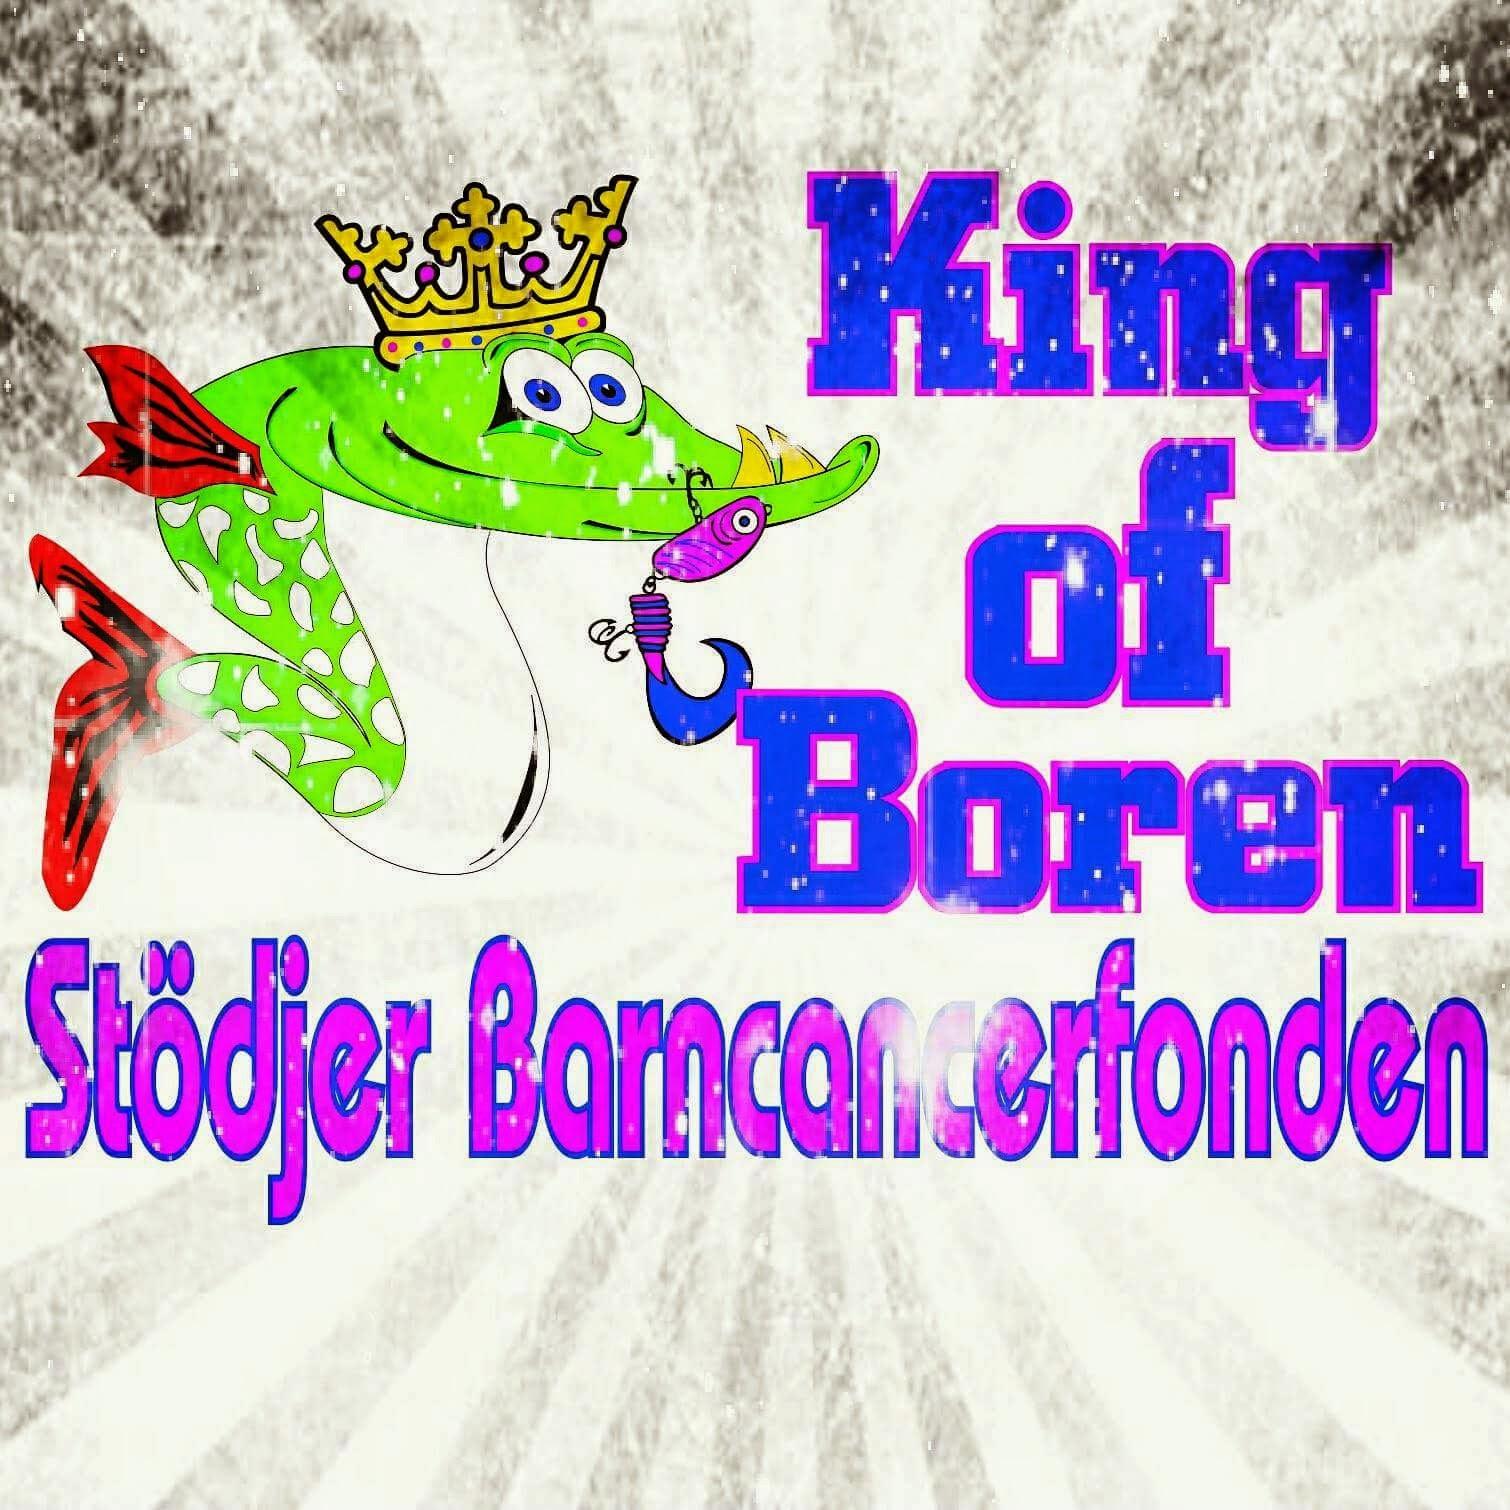 KING OF BOREN